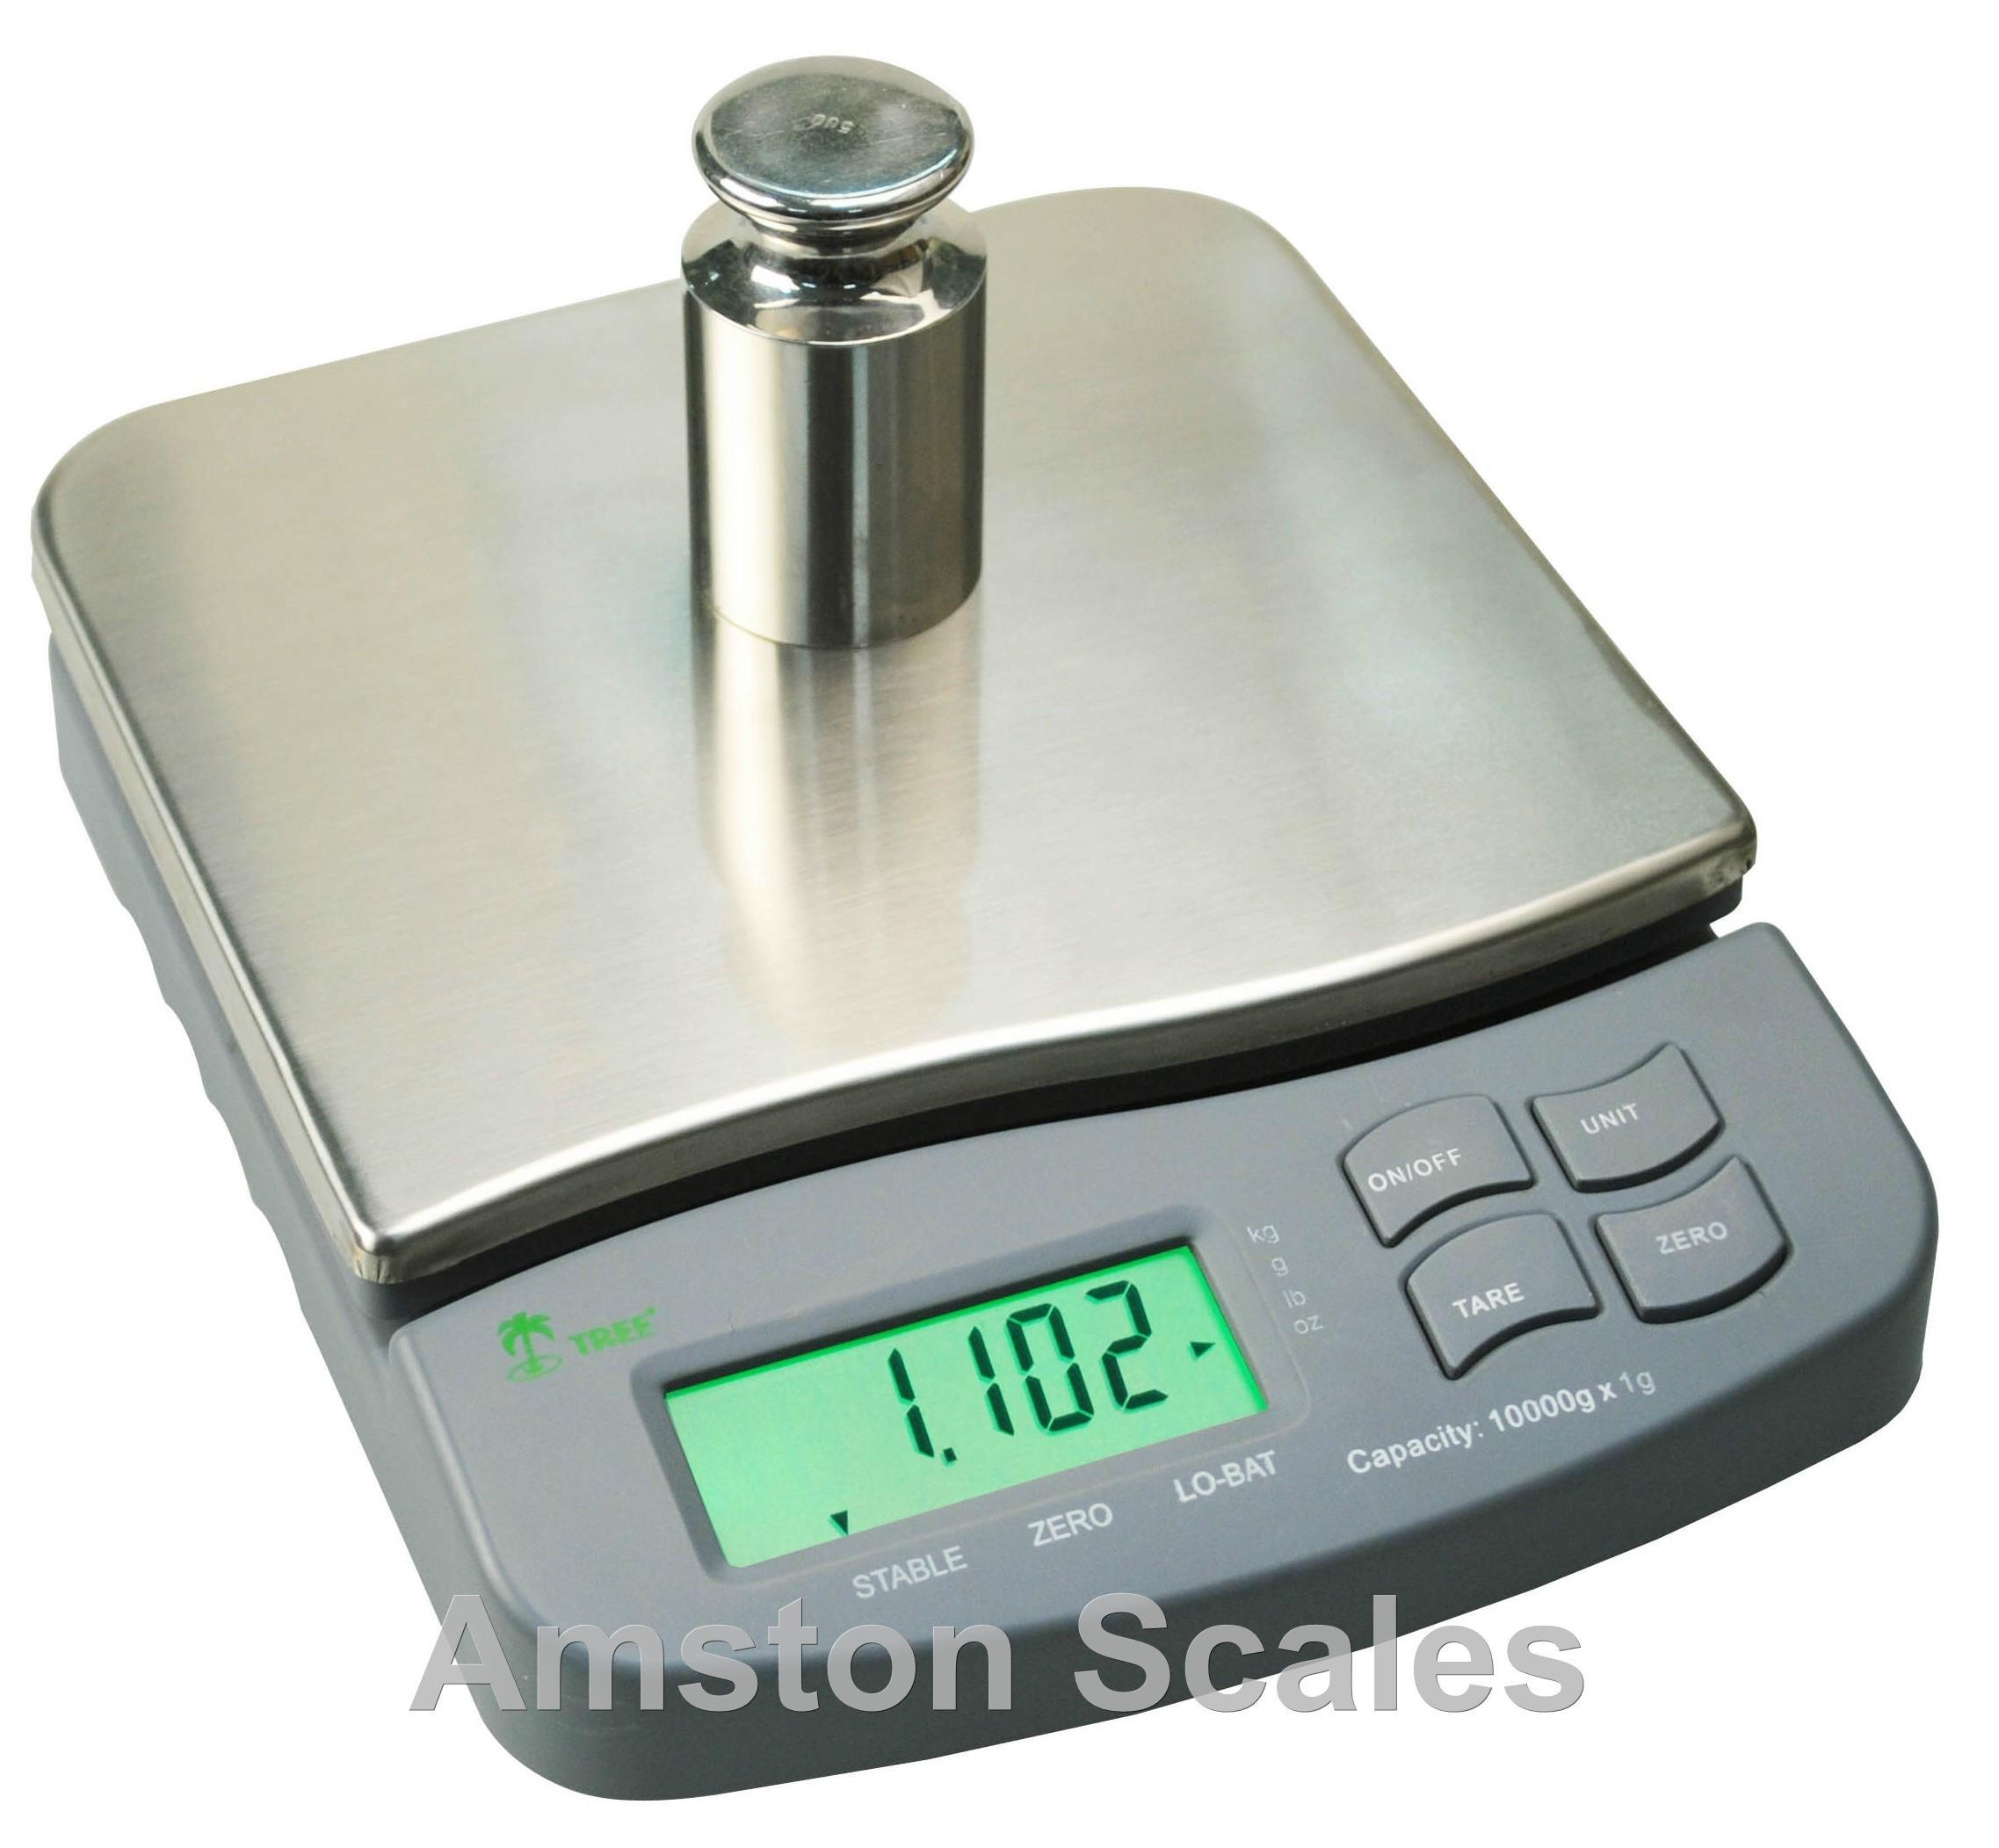 2500 gram x 0.1 gram / 5.5 LB mid resolution digital bench balance scale 6x7 inch platform Gun Powder Gold Jewelry by Amston Scales